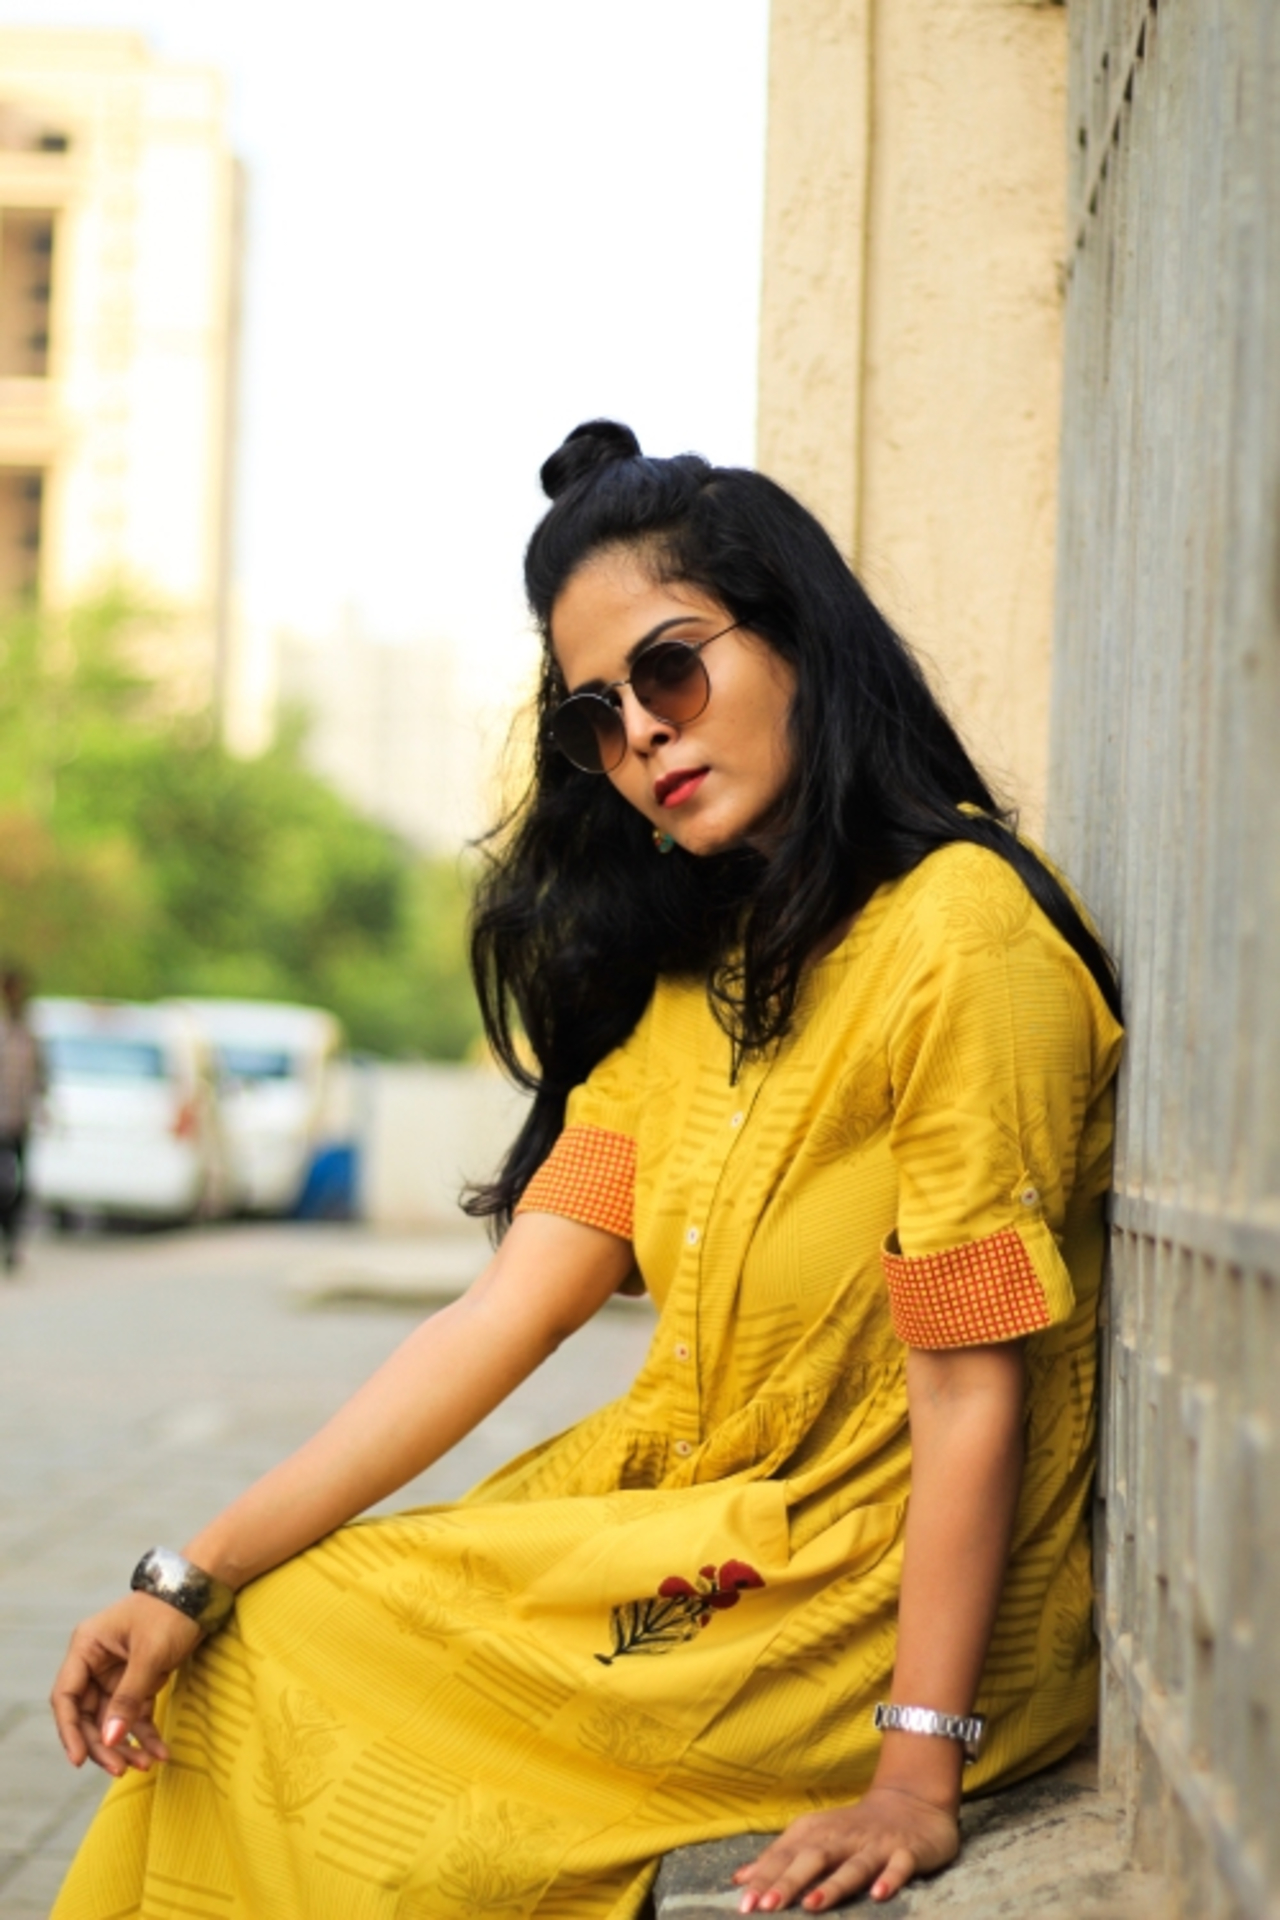 Embracing The Boho Vibes FT. Max India| Be #SpringForward image